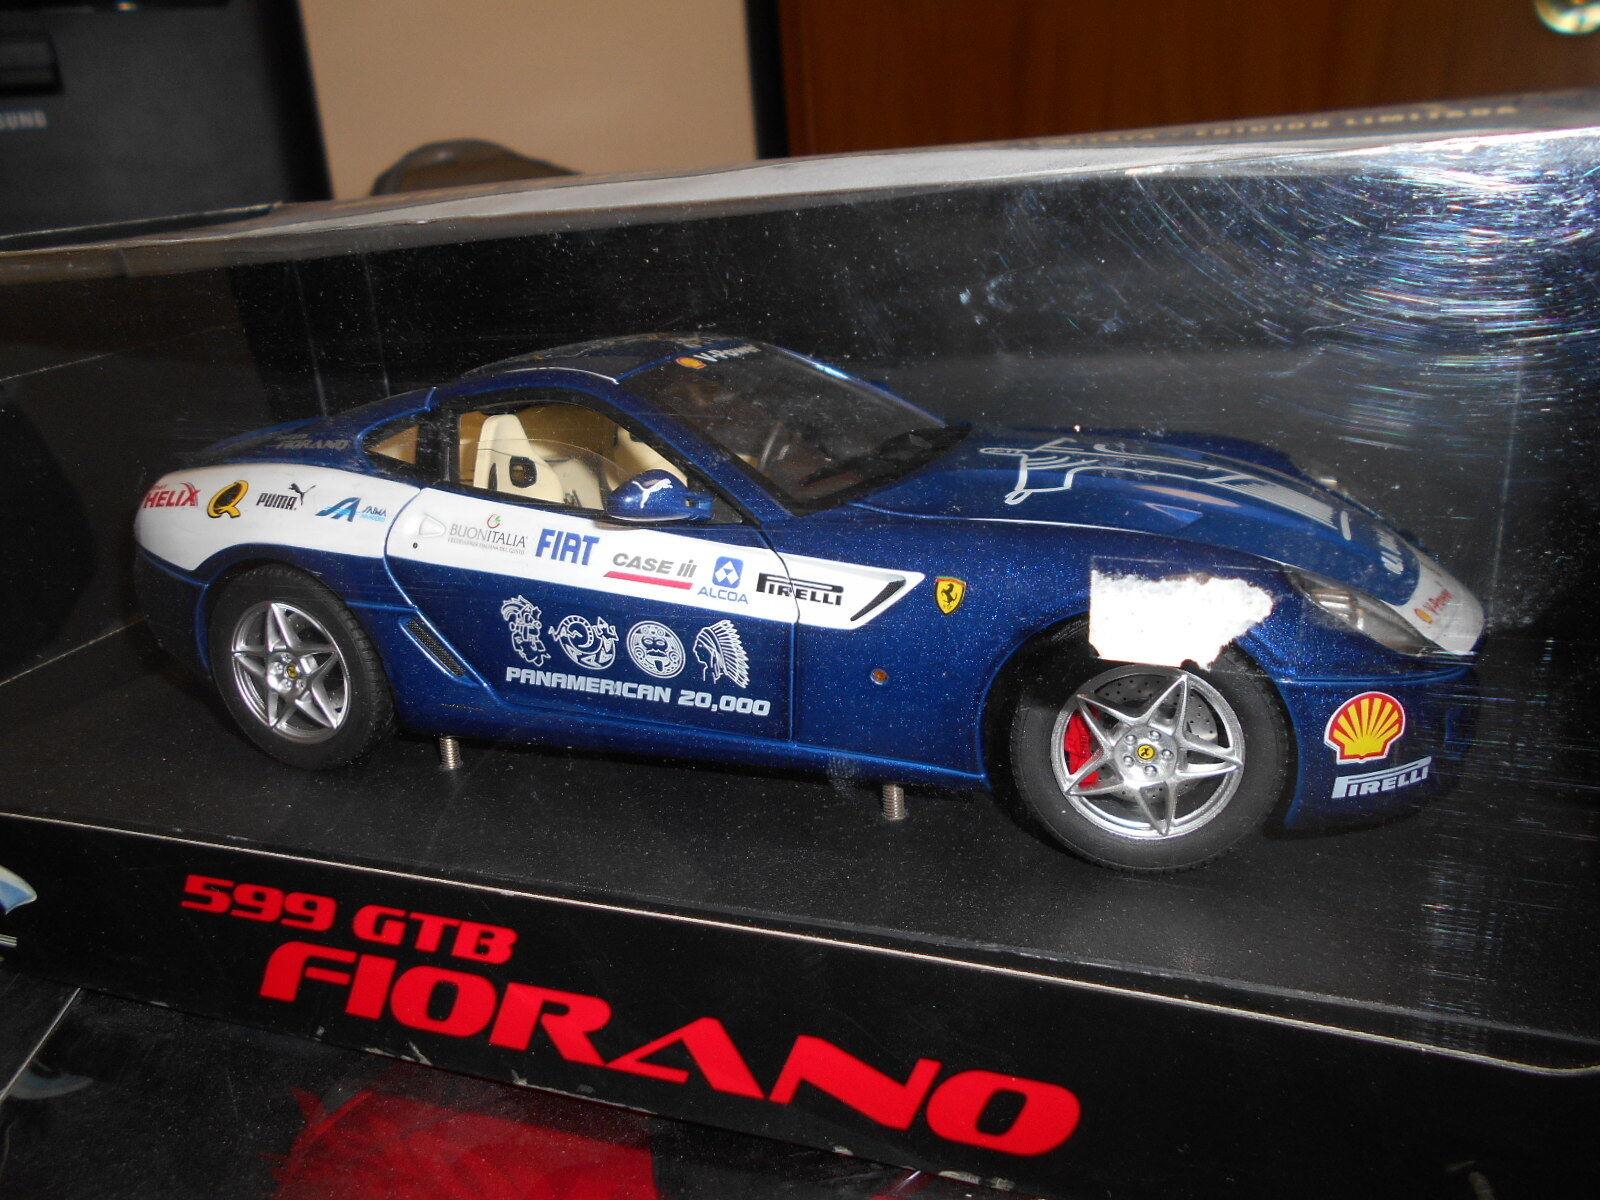 Hwehwej 2917-0510a Ferrari 599 GTB Fiorano Panamerican 20.000 1 18